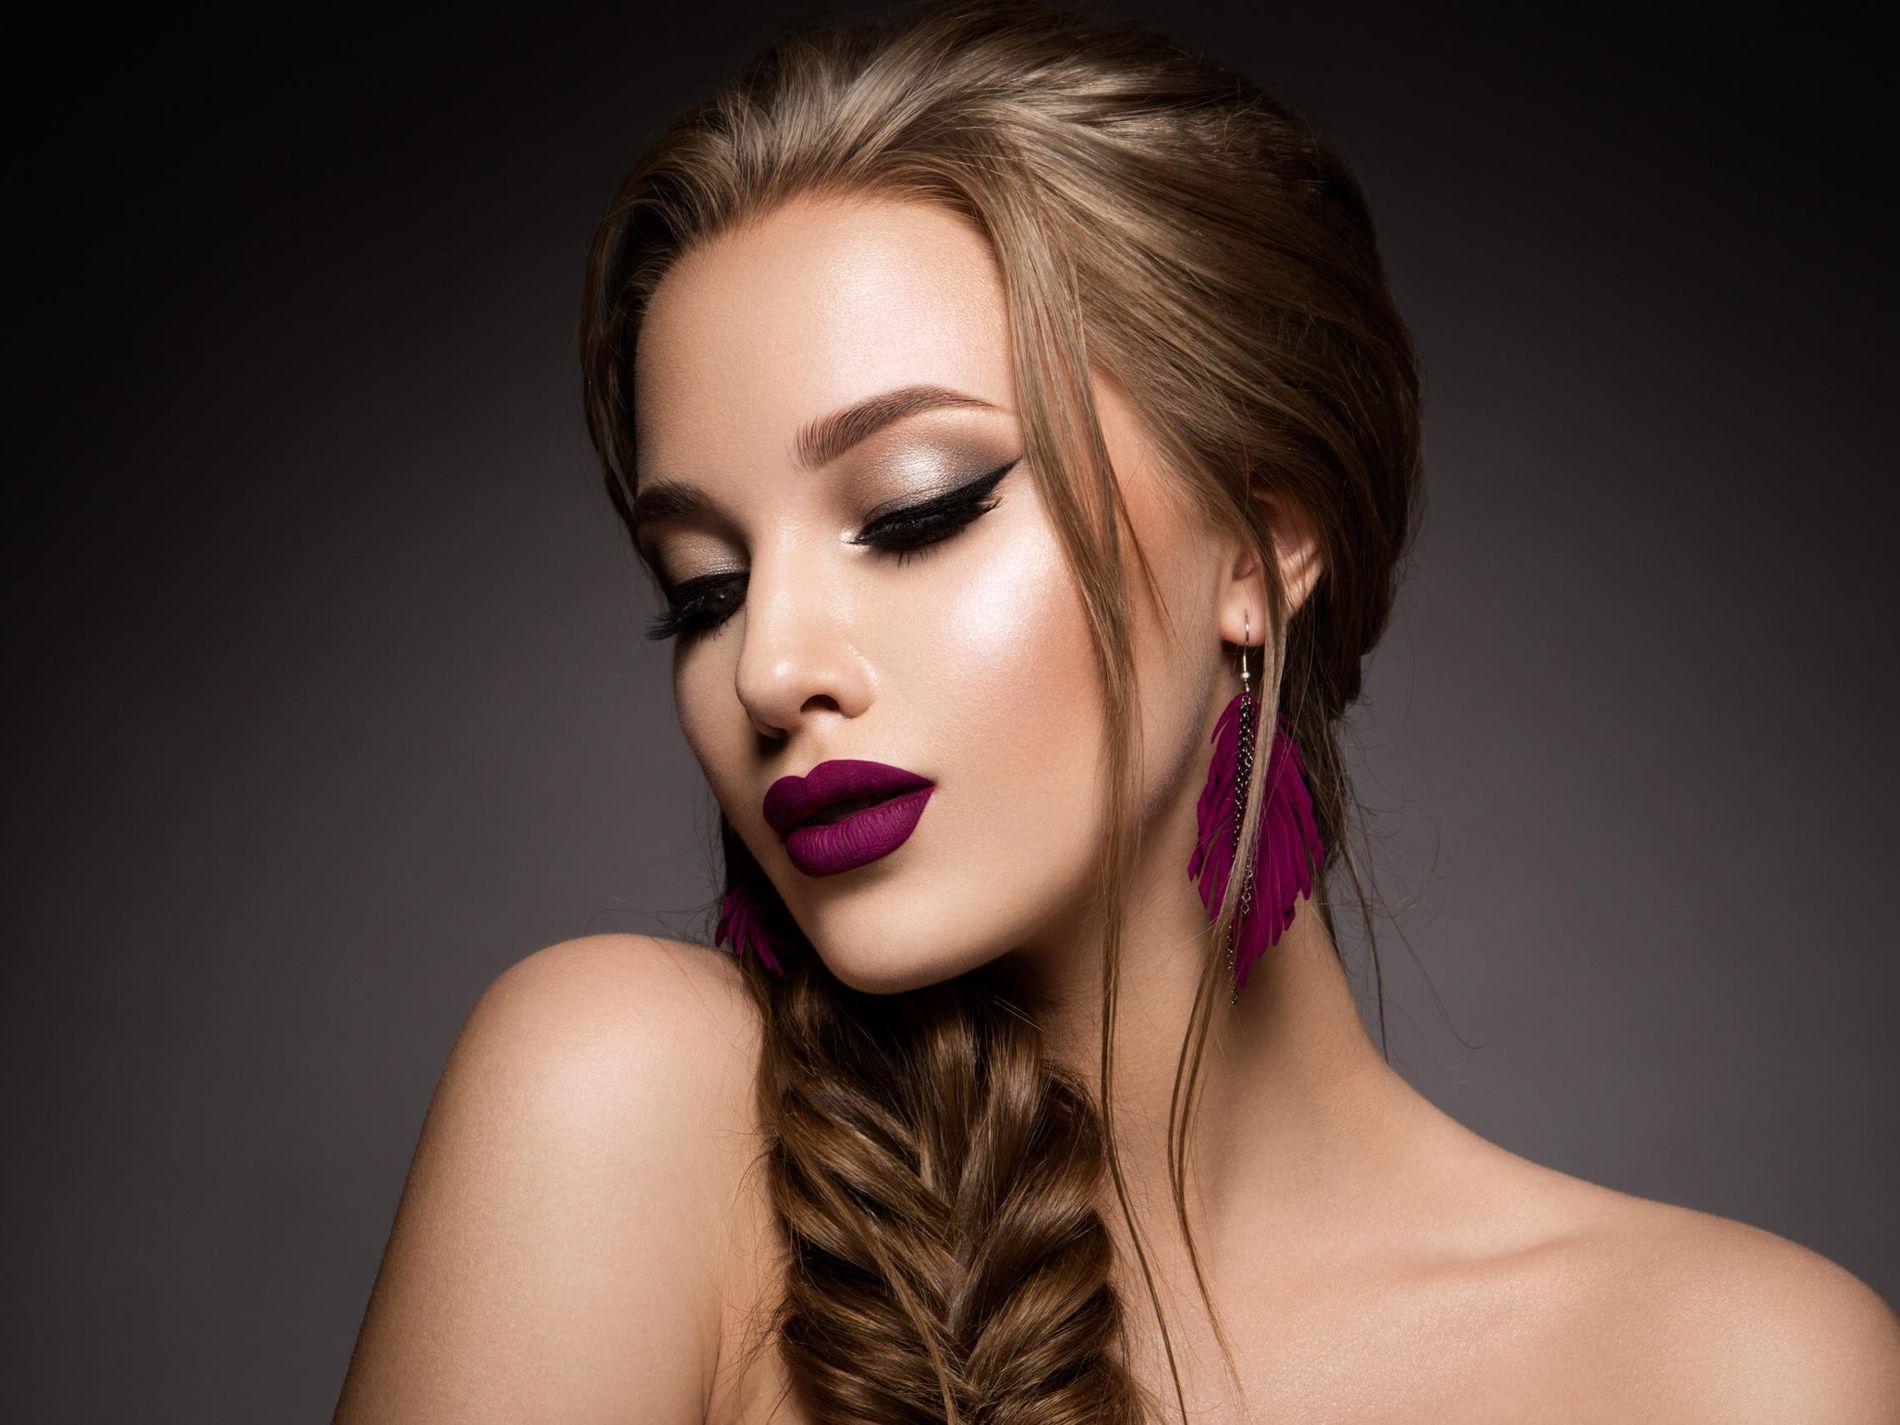 Eyebrow Threading Business For Sale